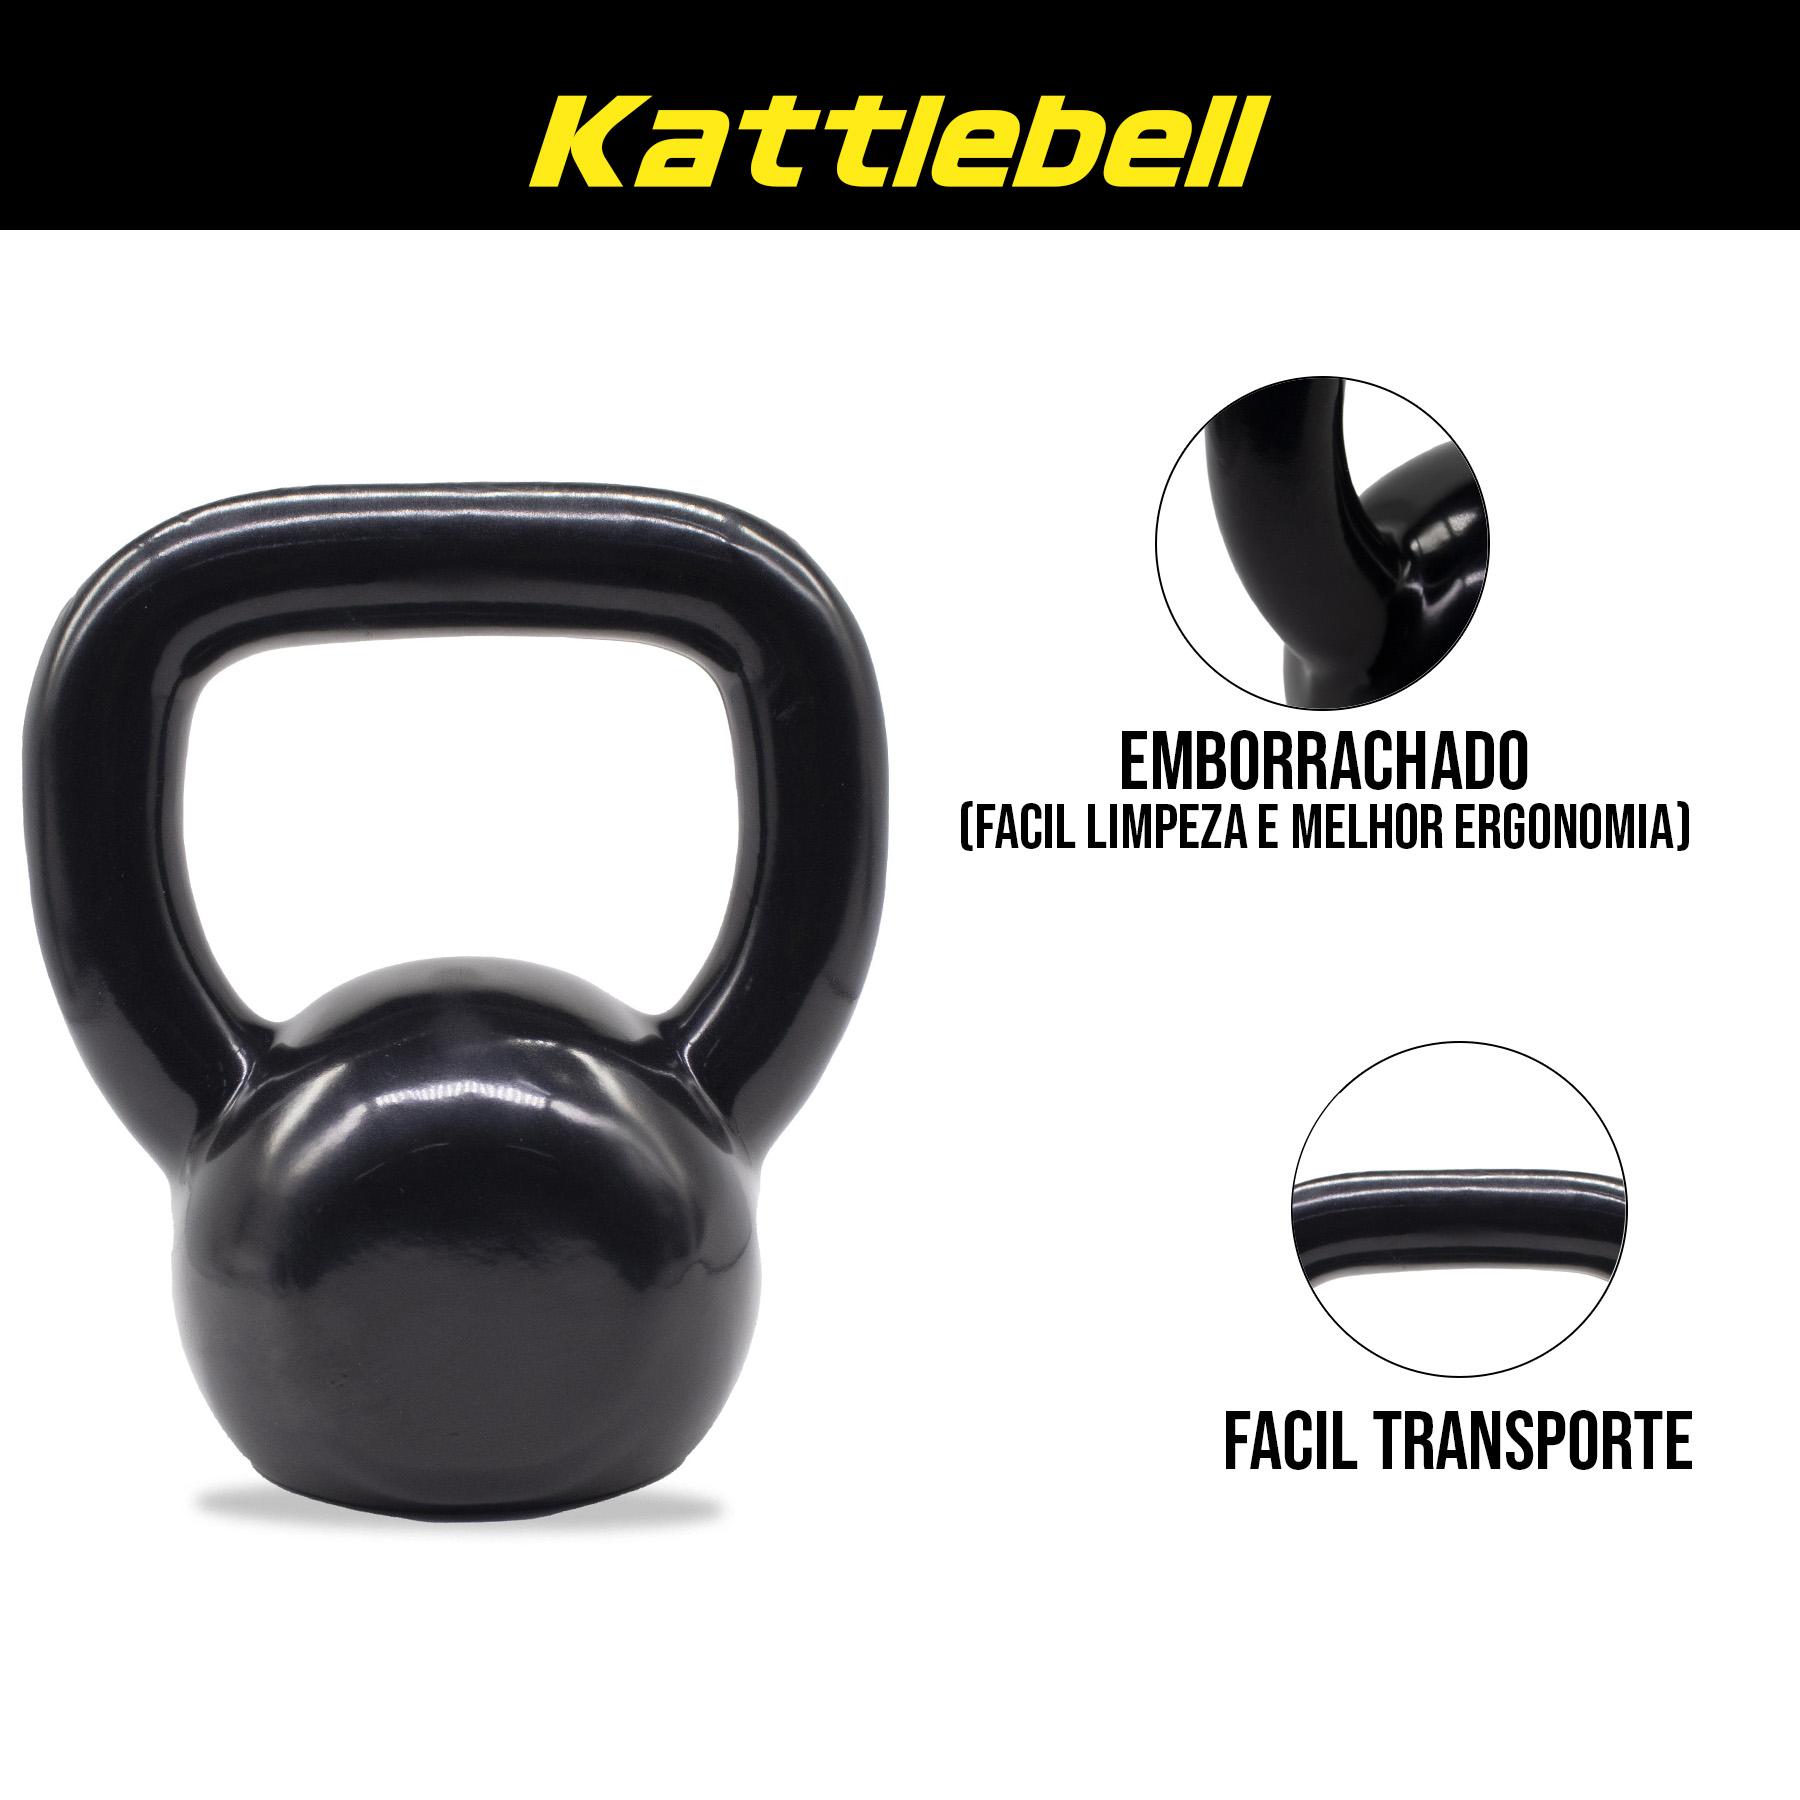 Kettlebell Emborrachado Peso:14KG